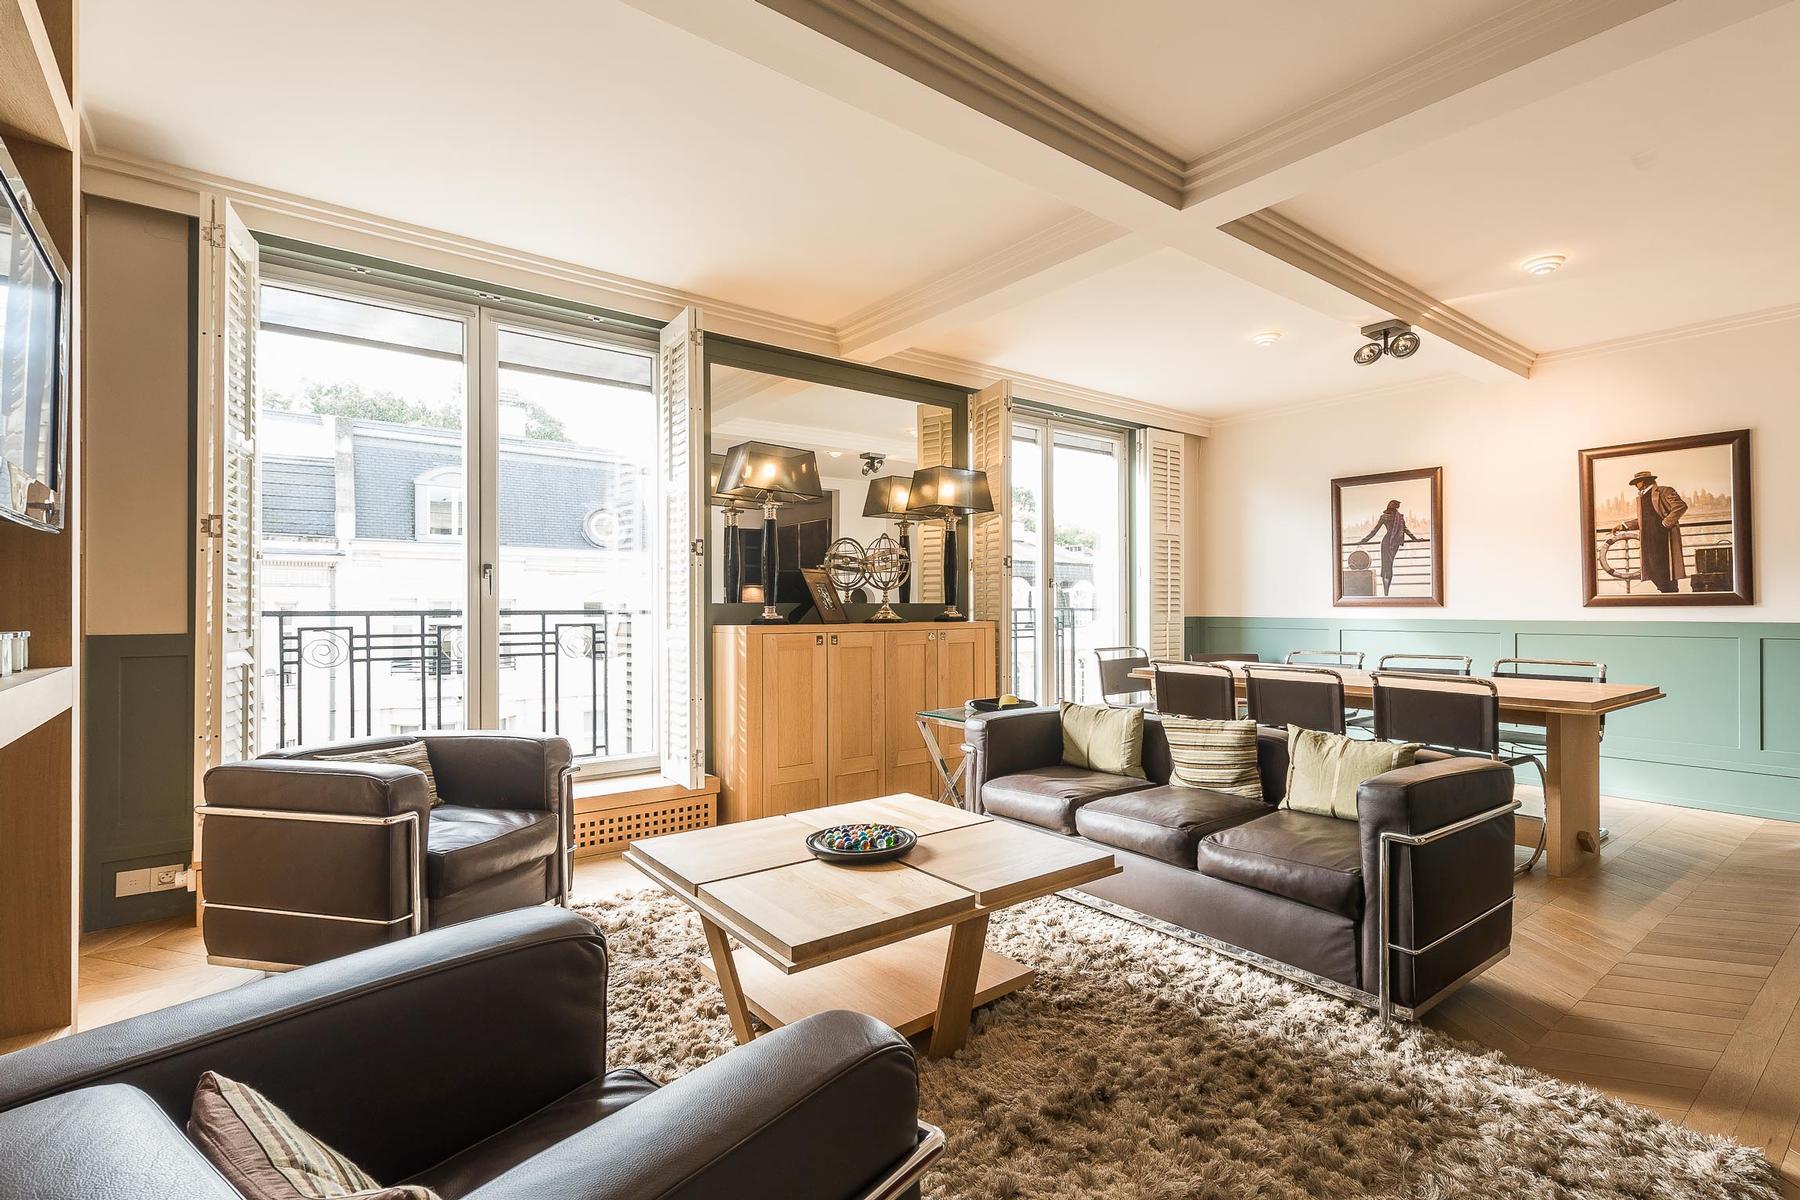 Apartment for Rent at Ixelles I Square du Bois 539 Avenue Louise Brussels, Brussels 1000 Belgium